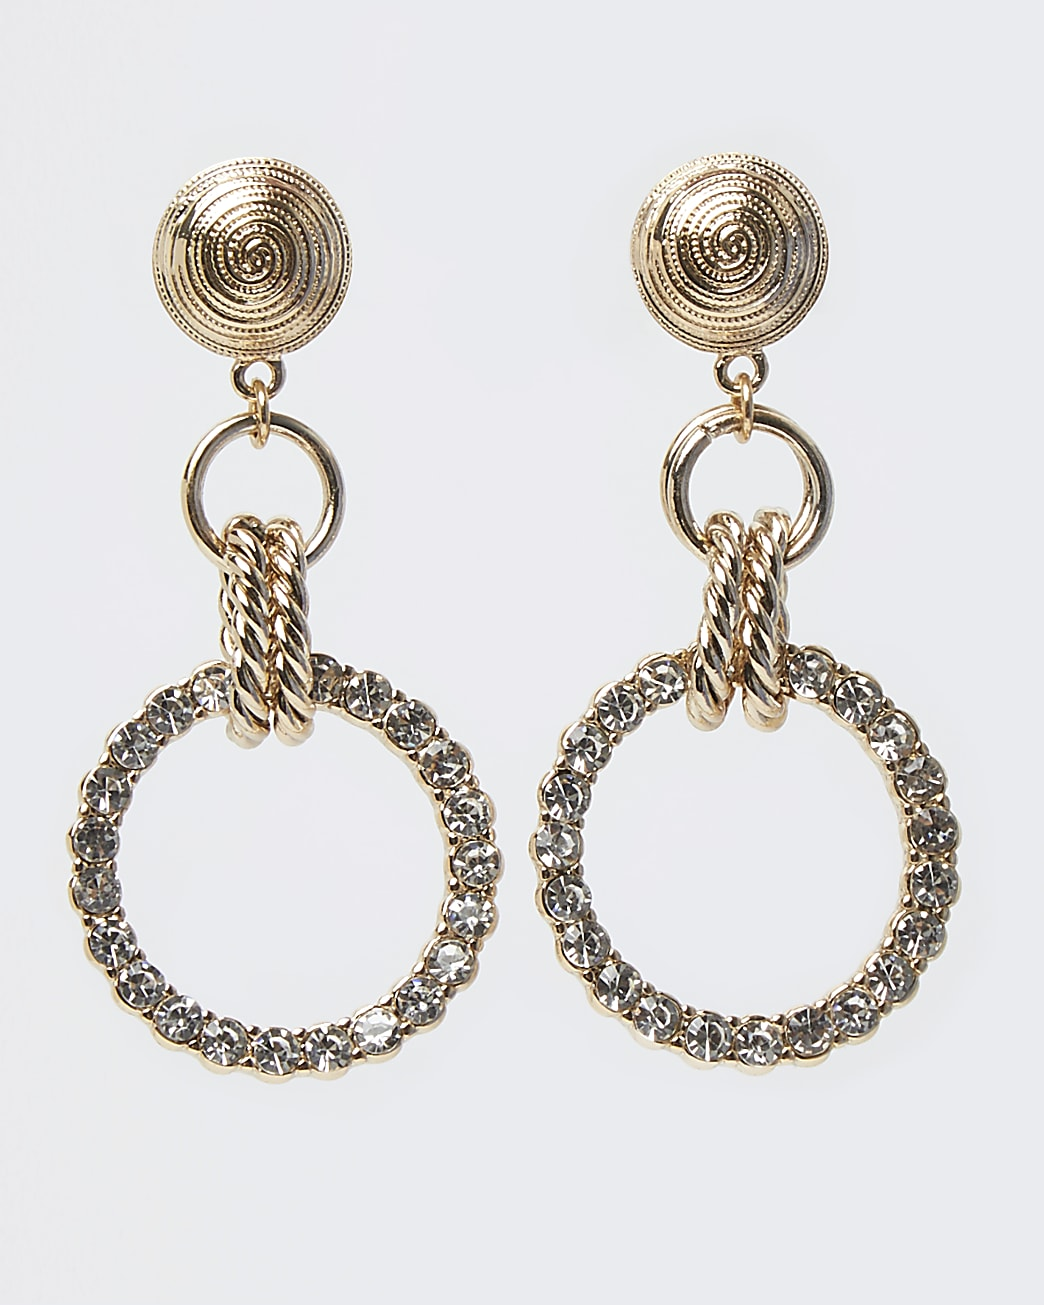 Gold diamante drop earrings